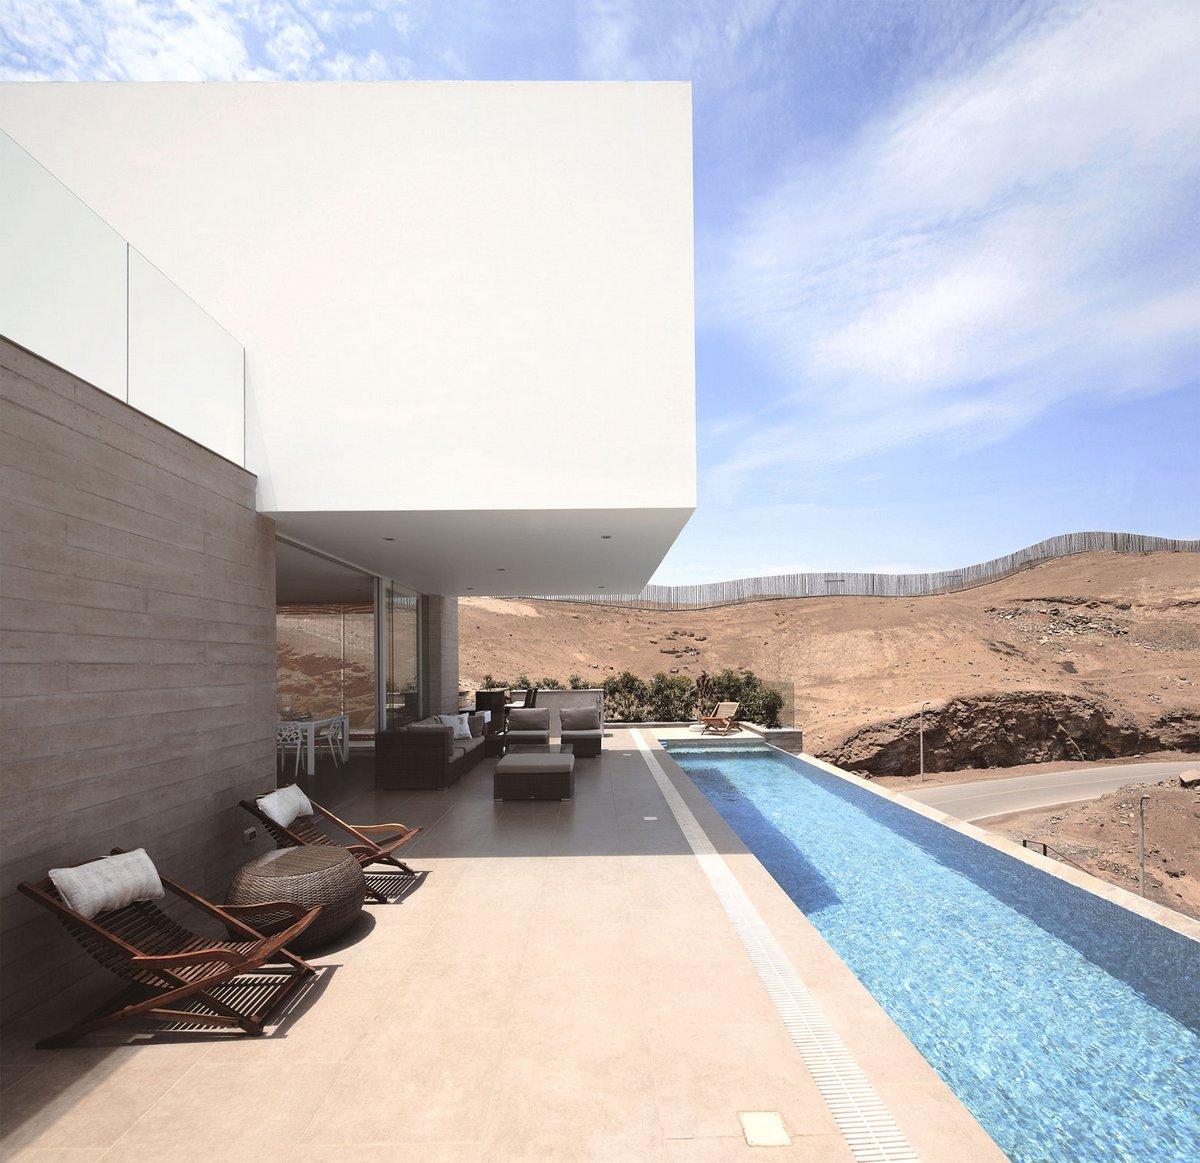 планировка частного дома фото, схема частного дома фото, Пукусана, Перу, Domenack Arquitectos, дом с видом на залив фото, дом с видом на город фото